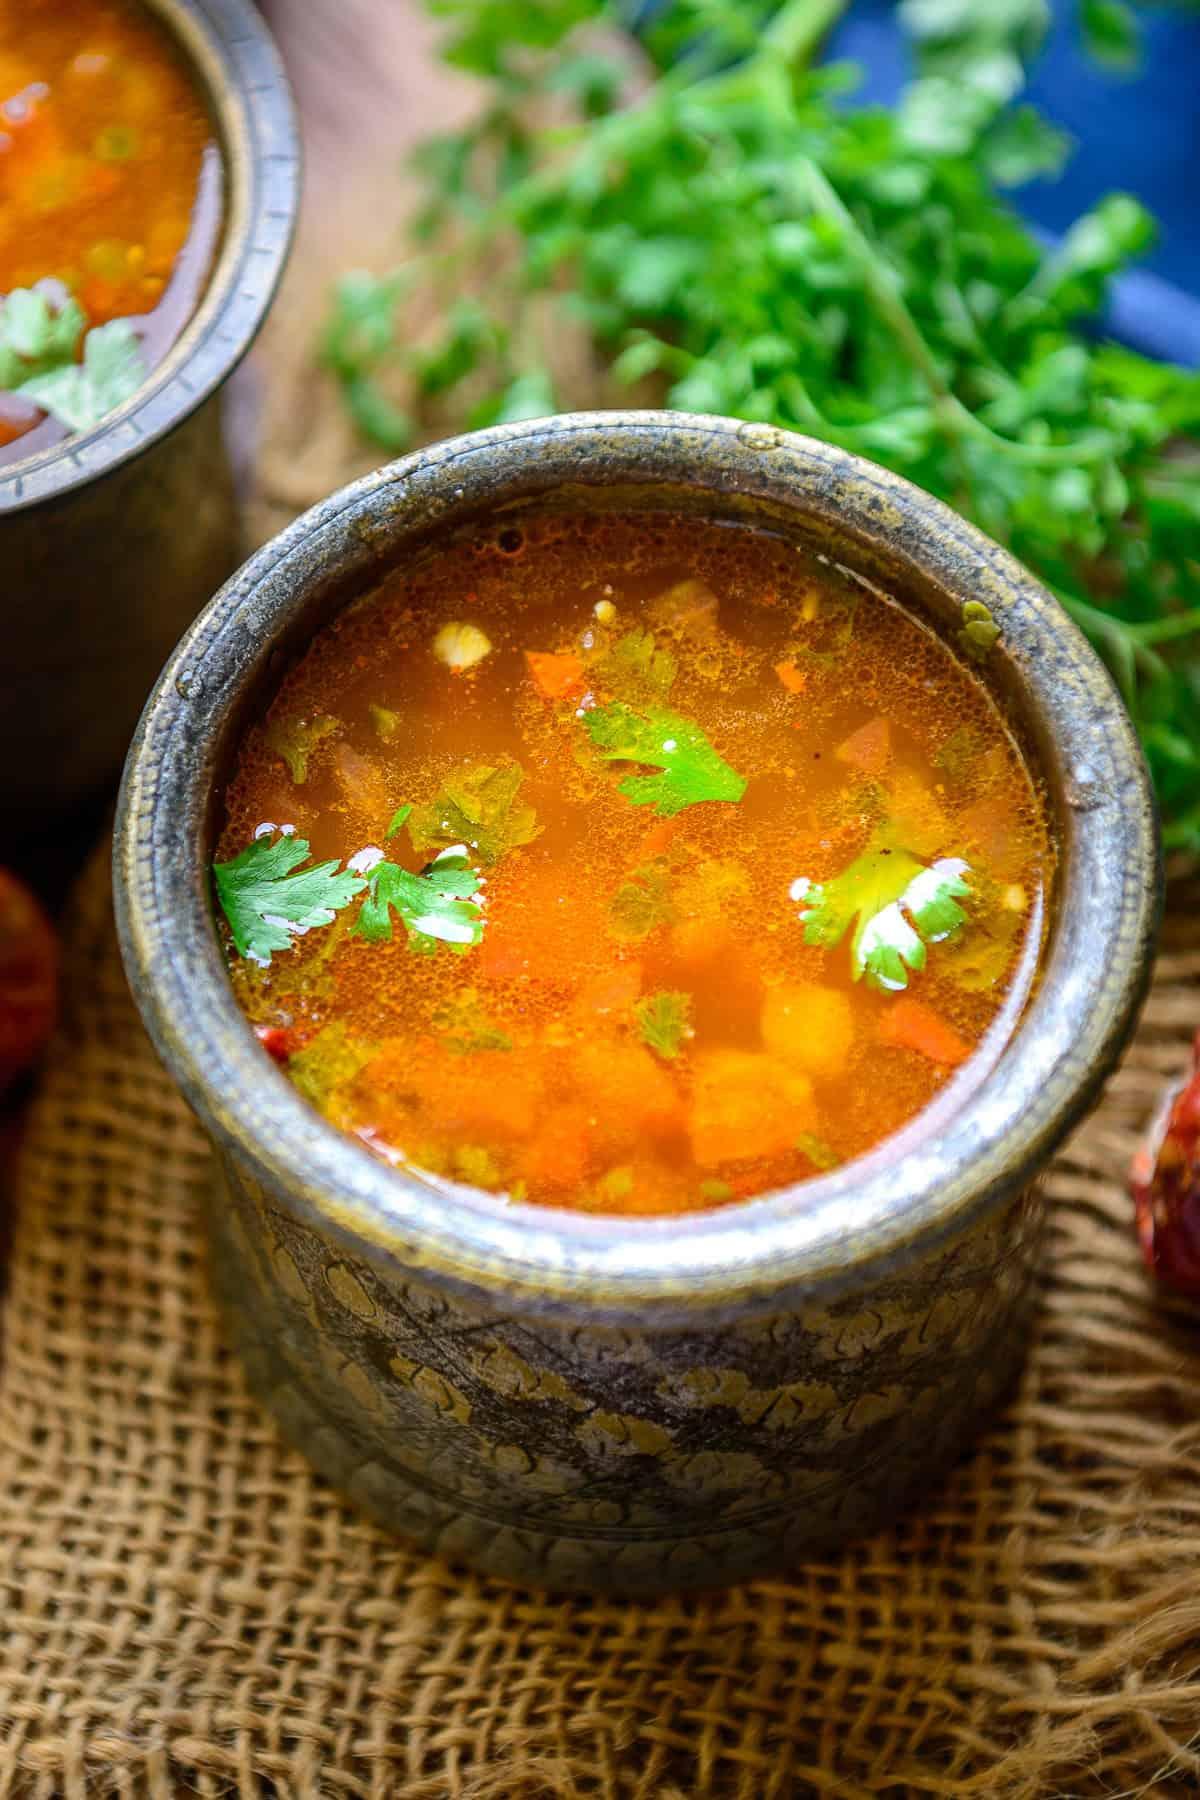 Tomato rasam served in a bowl.